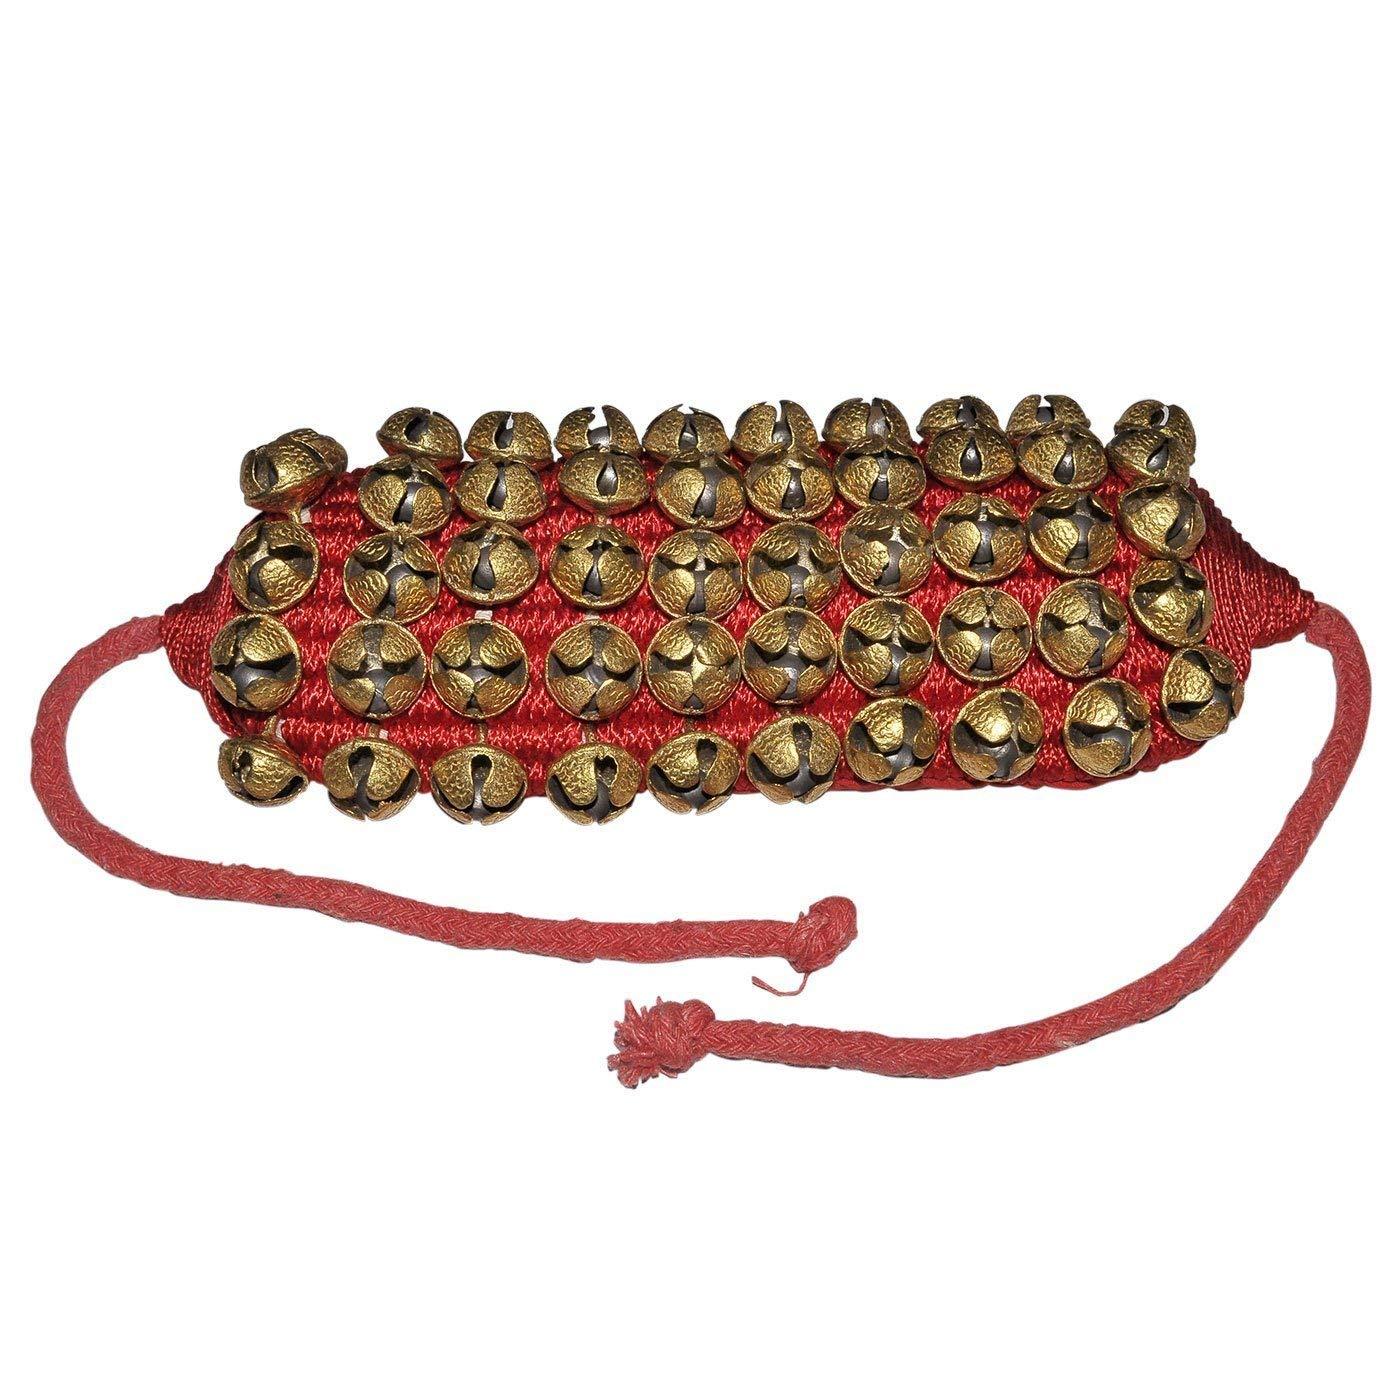 Brass Red Ped 5 Line Big Bells (16 No. Ghungroo) Kathak Ghungroo Ghungroo Kathak anklet women dance accessories